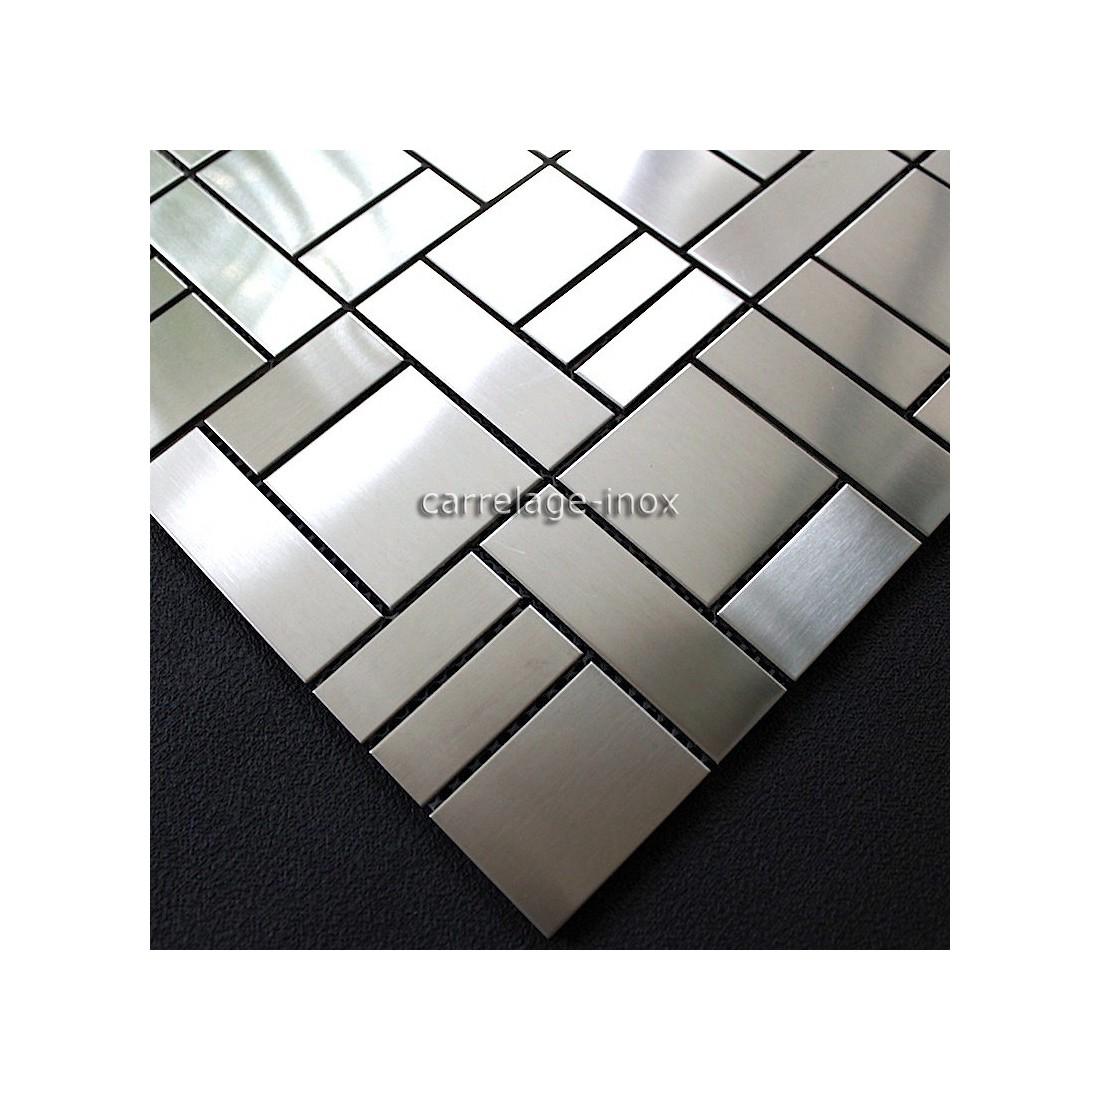 Carrelage inox mosaique modele erato carrelage for Model de carrelage